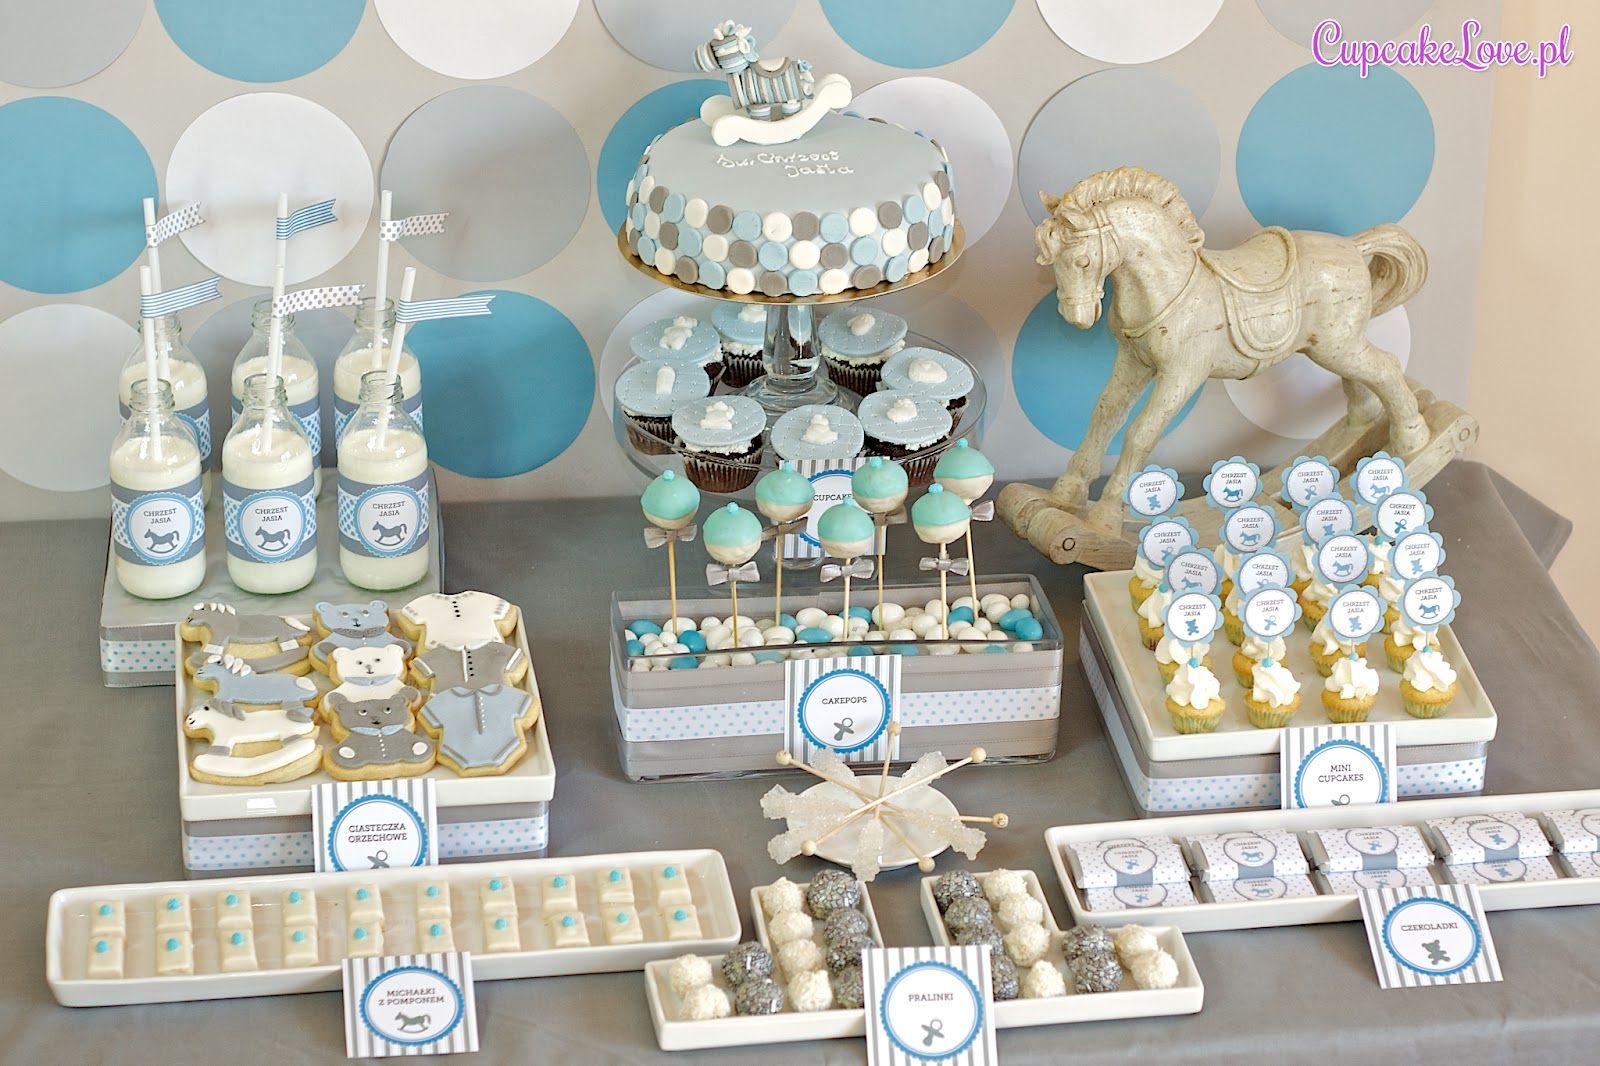 Pin By Malgorzata Jakimik On Dessert Tables Baptism Cake Boy Christening Dessert Table Baby Shower Dessert Table